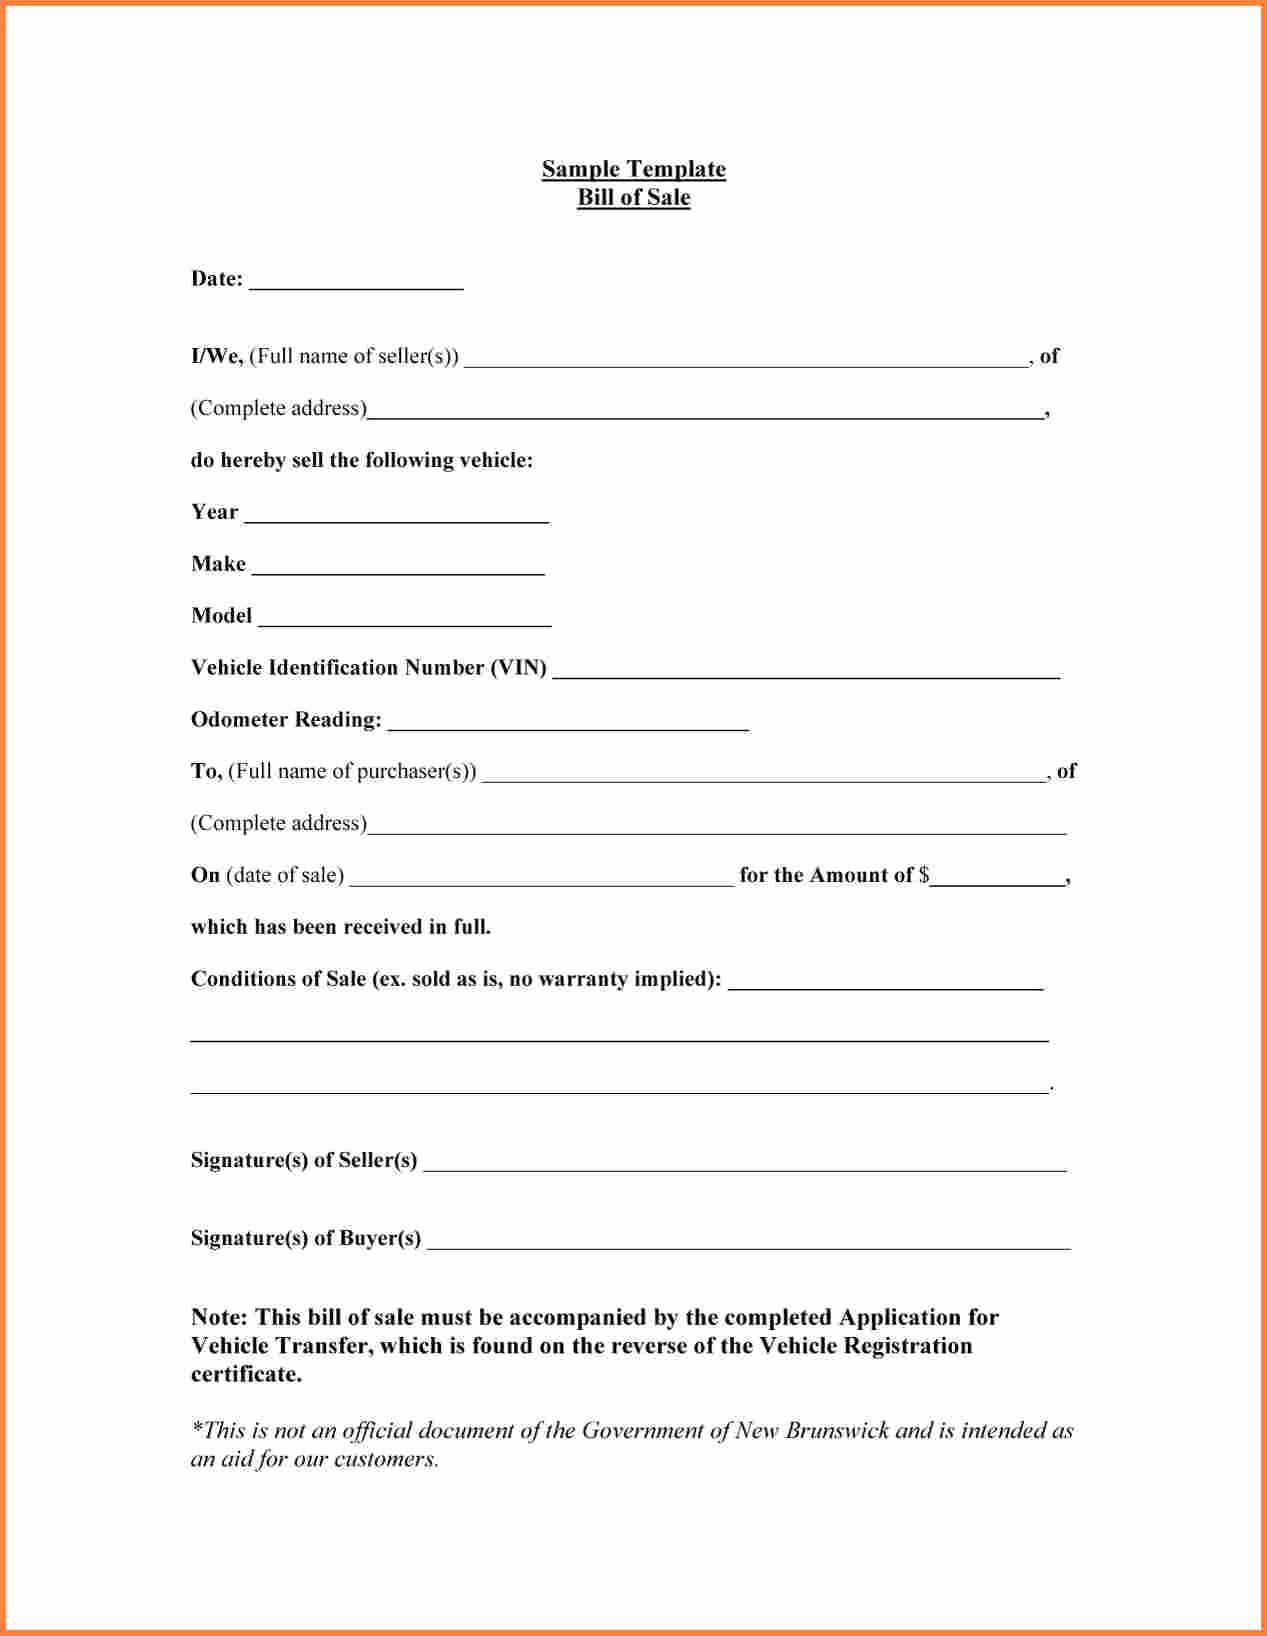 Bill Of Sale Sample Car New Sample Bill Of Sale form for Car Printable